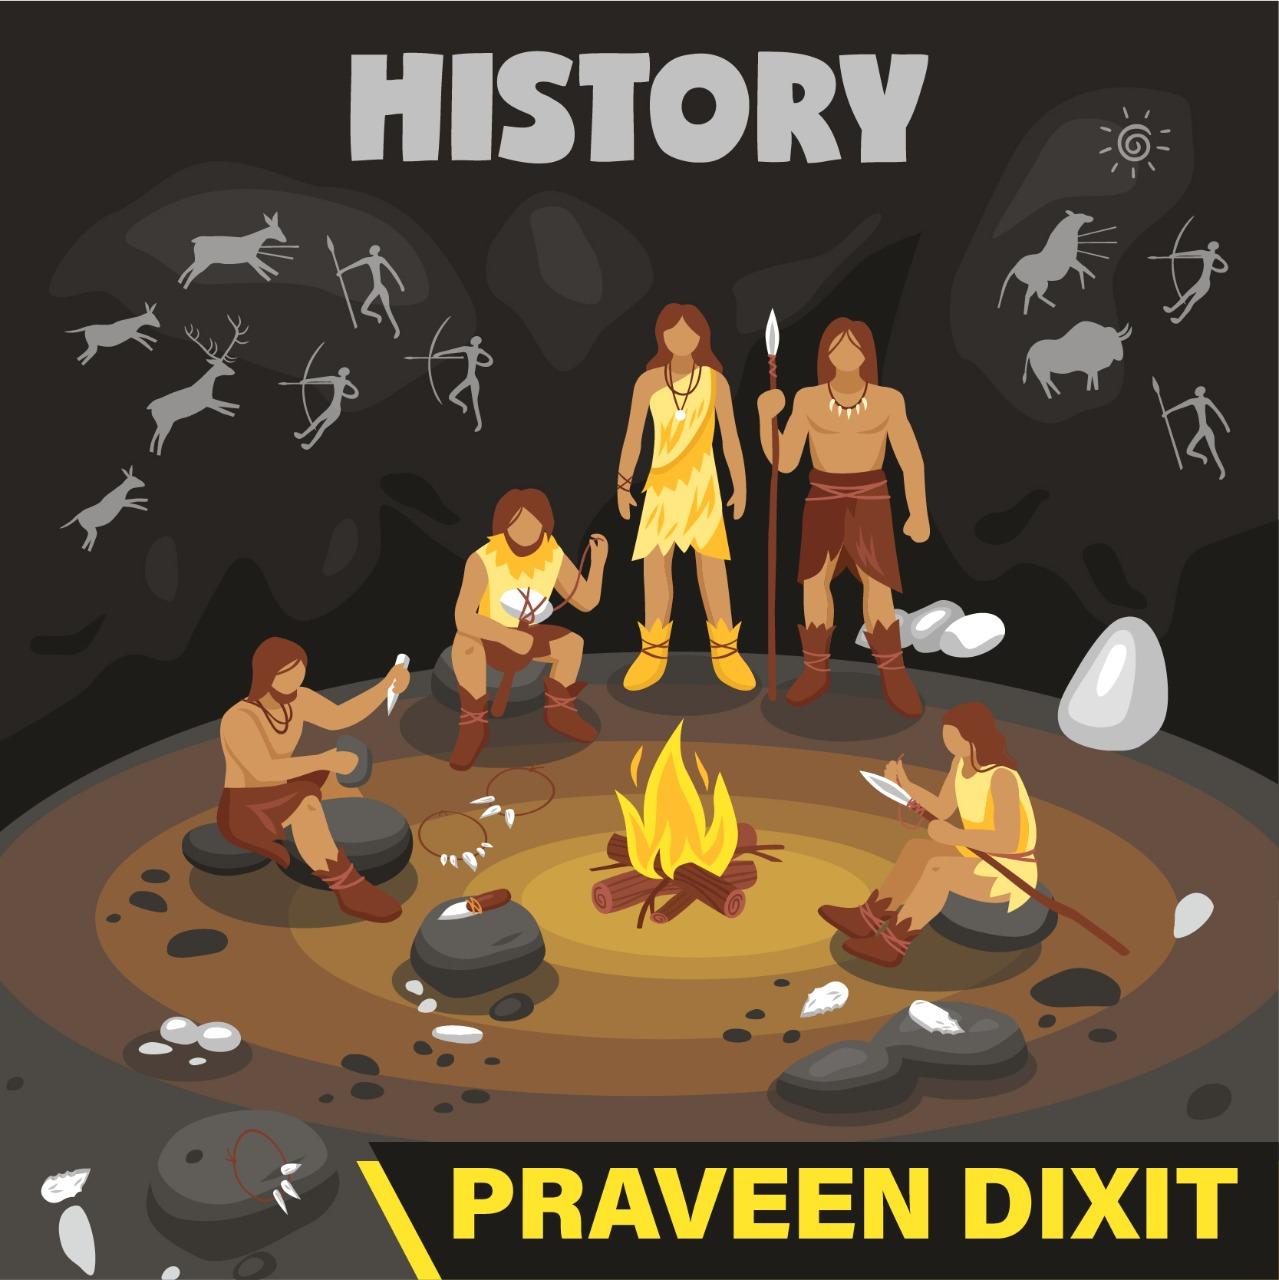 Praveen Dixit - INDIAN HISTORY